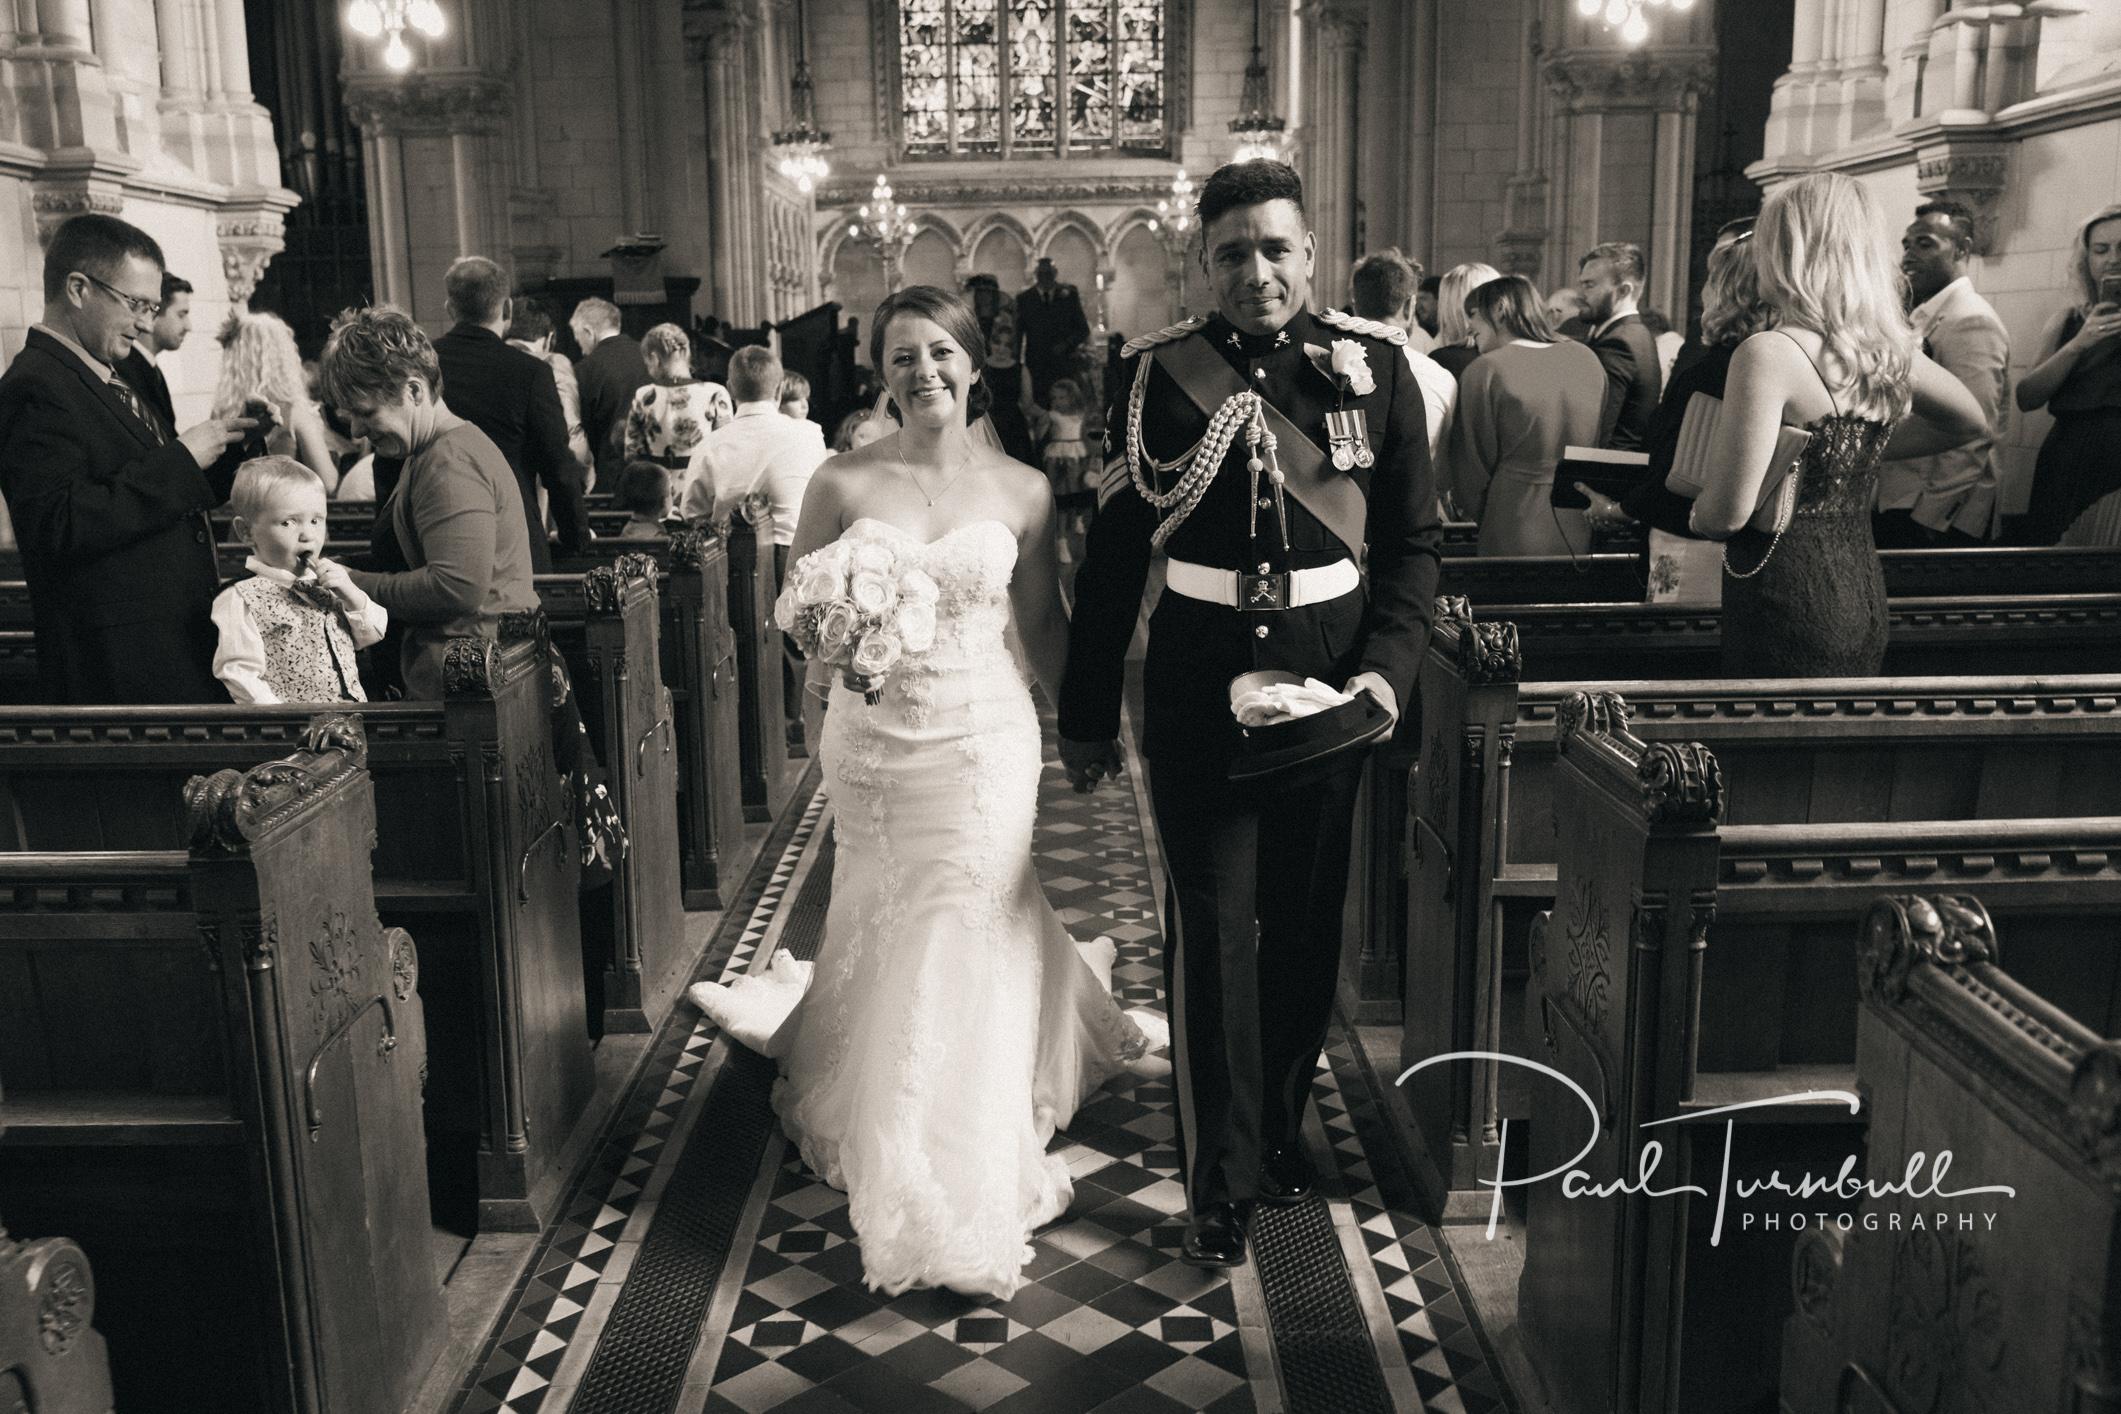 wedding-photographer-south-dalton-walkington-yorkshire-emma-james-036.jpg